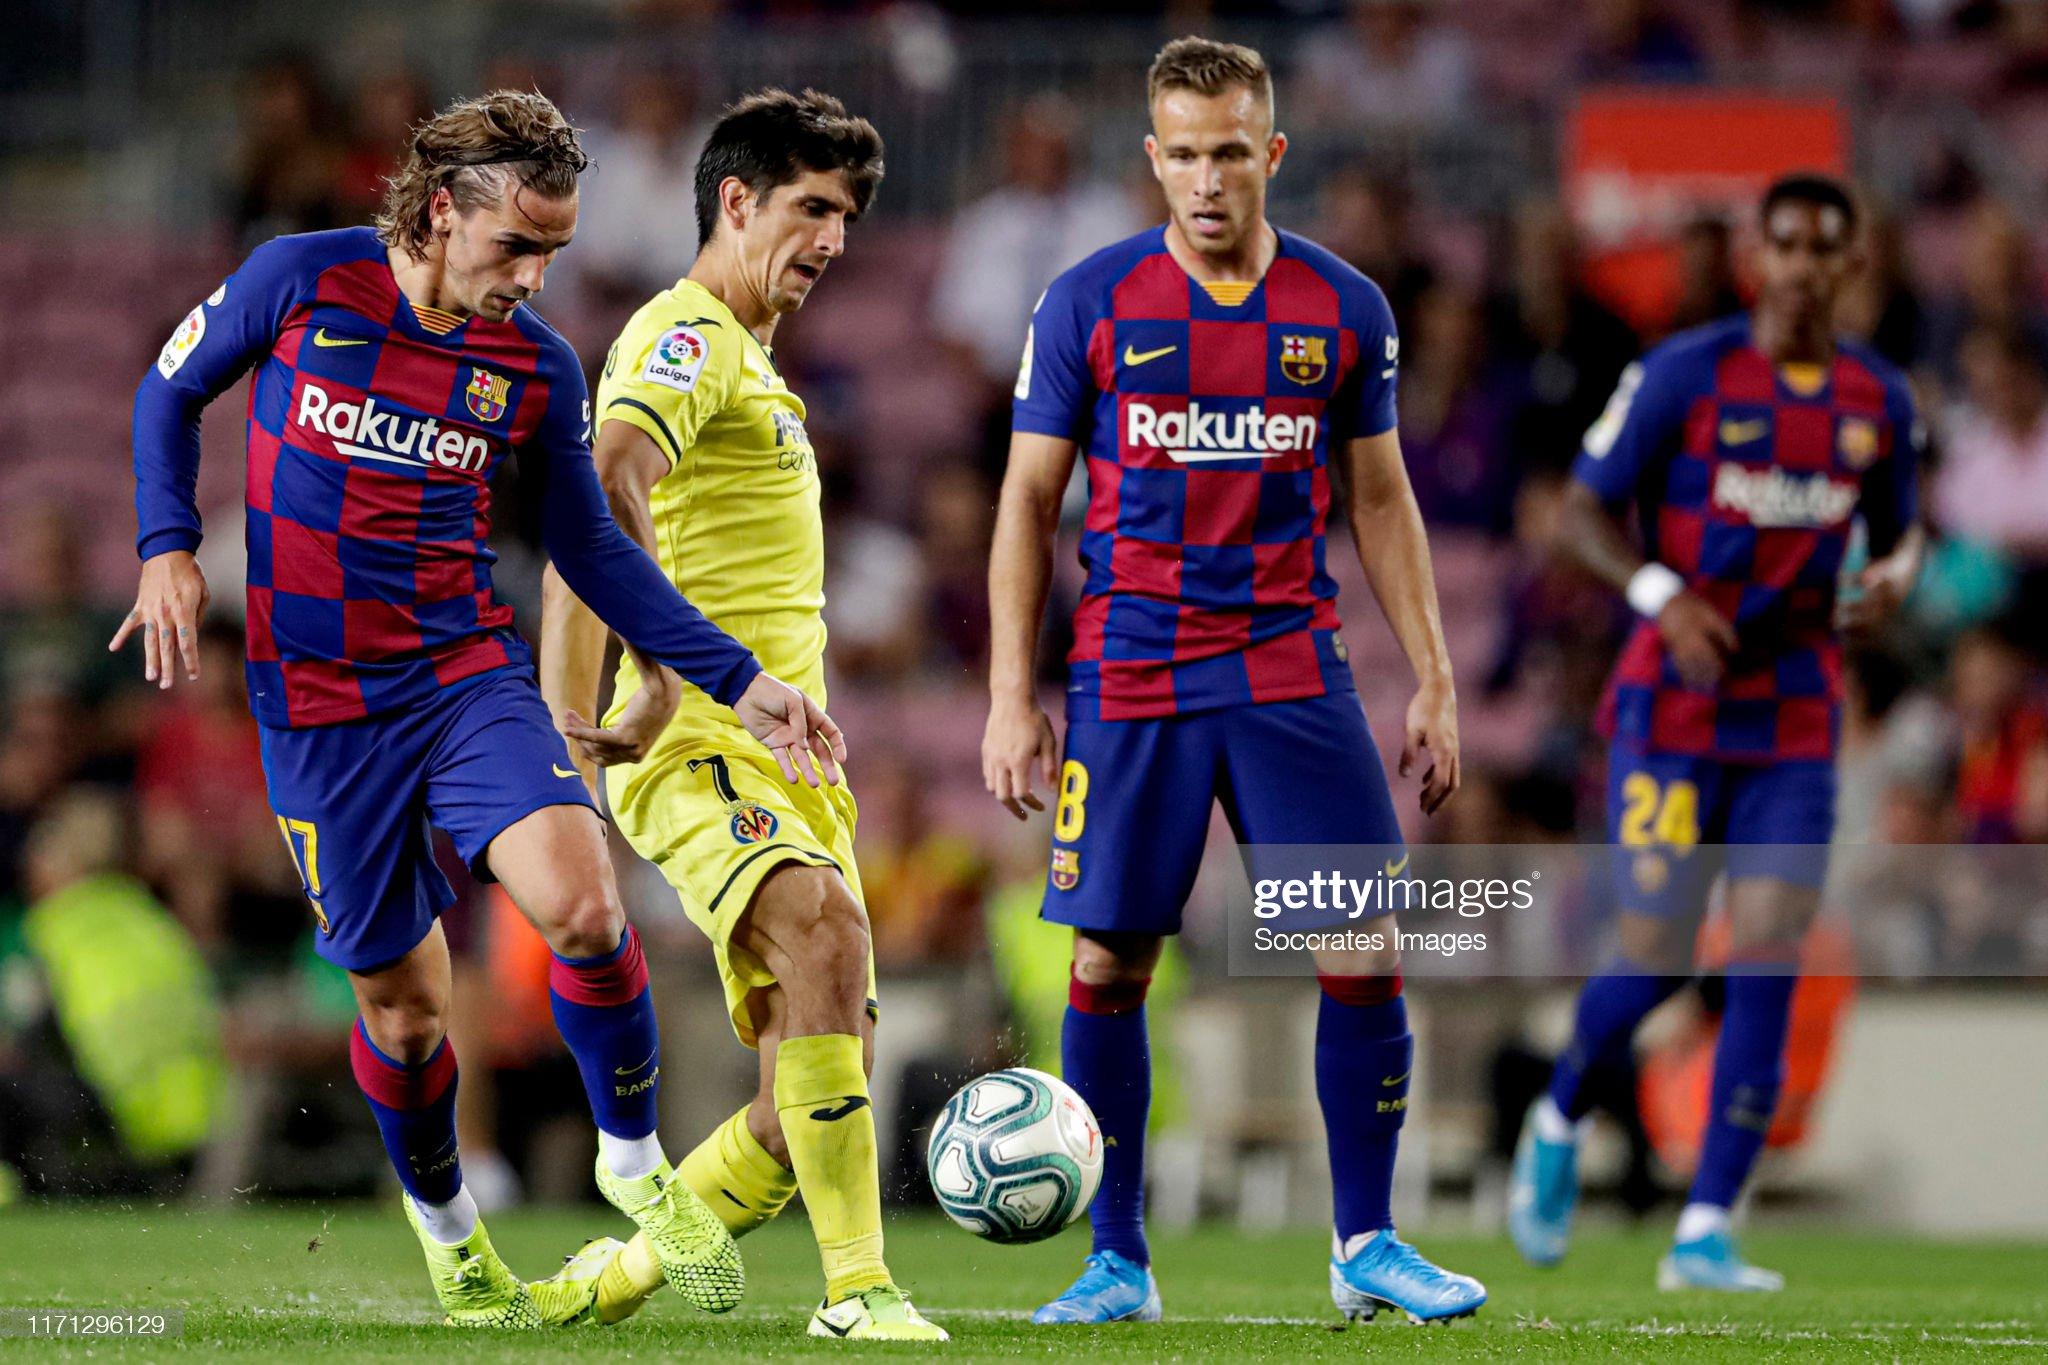 صور مباراة : برشلونة - فياريال 2-1 ( 24-09-2019 )  Antoine-griezmann-of-fc-barcelona-gerard-moreno-of-villarreal-during-picture-id1171296129?s=2048x2048